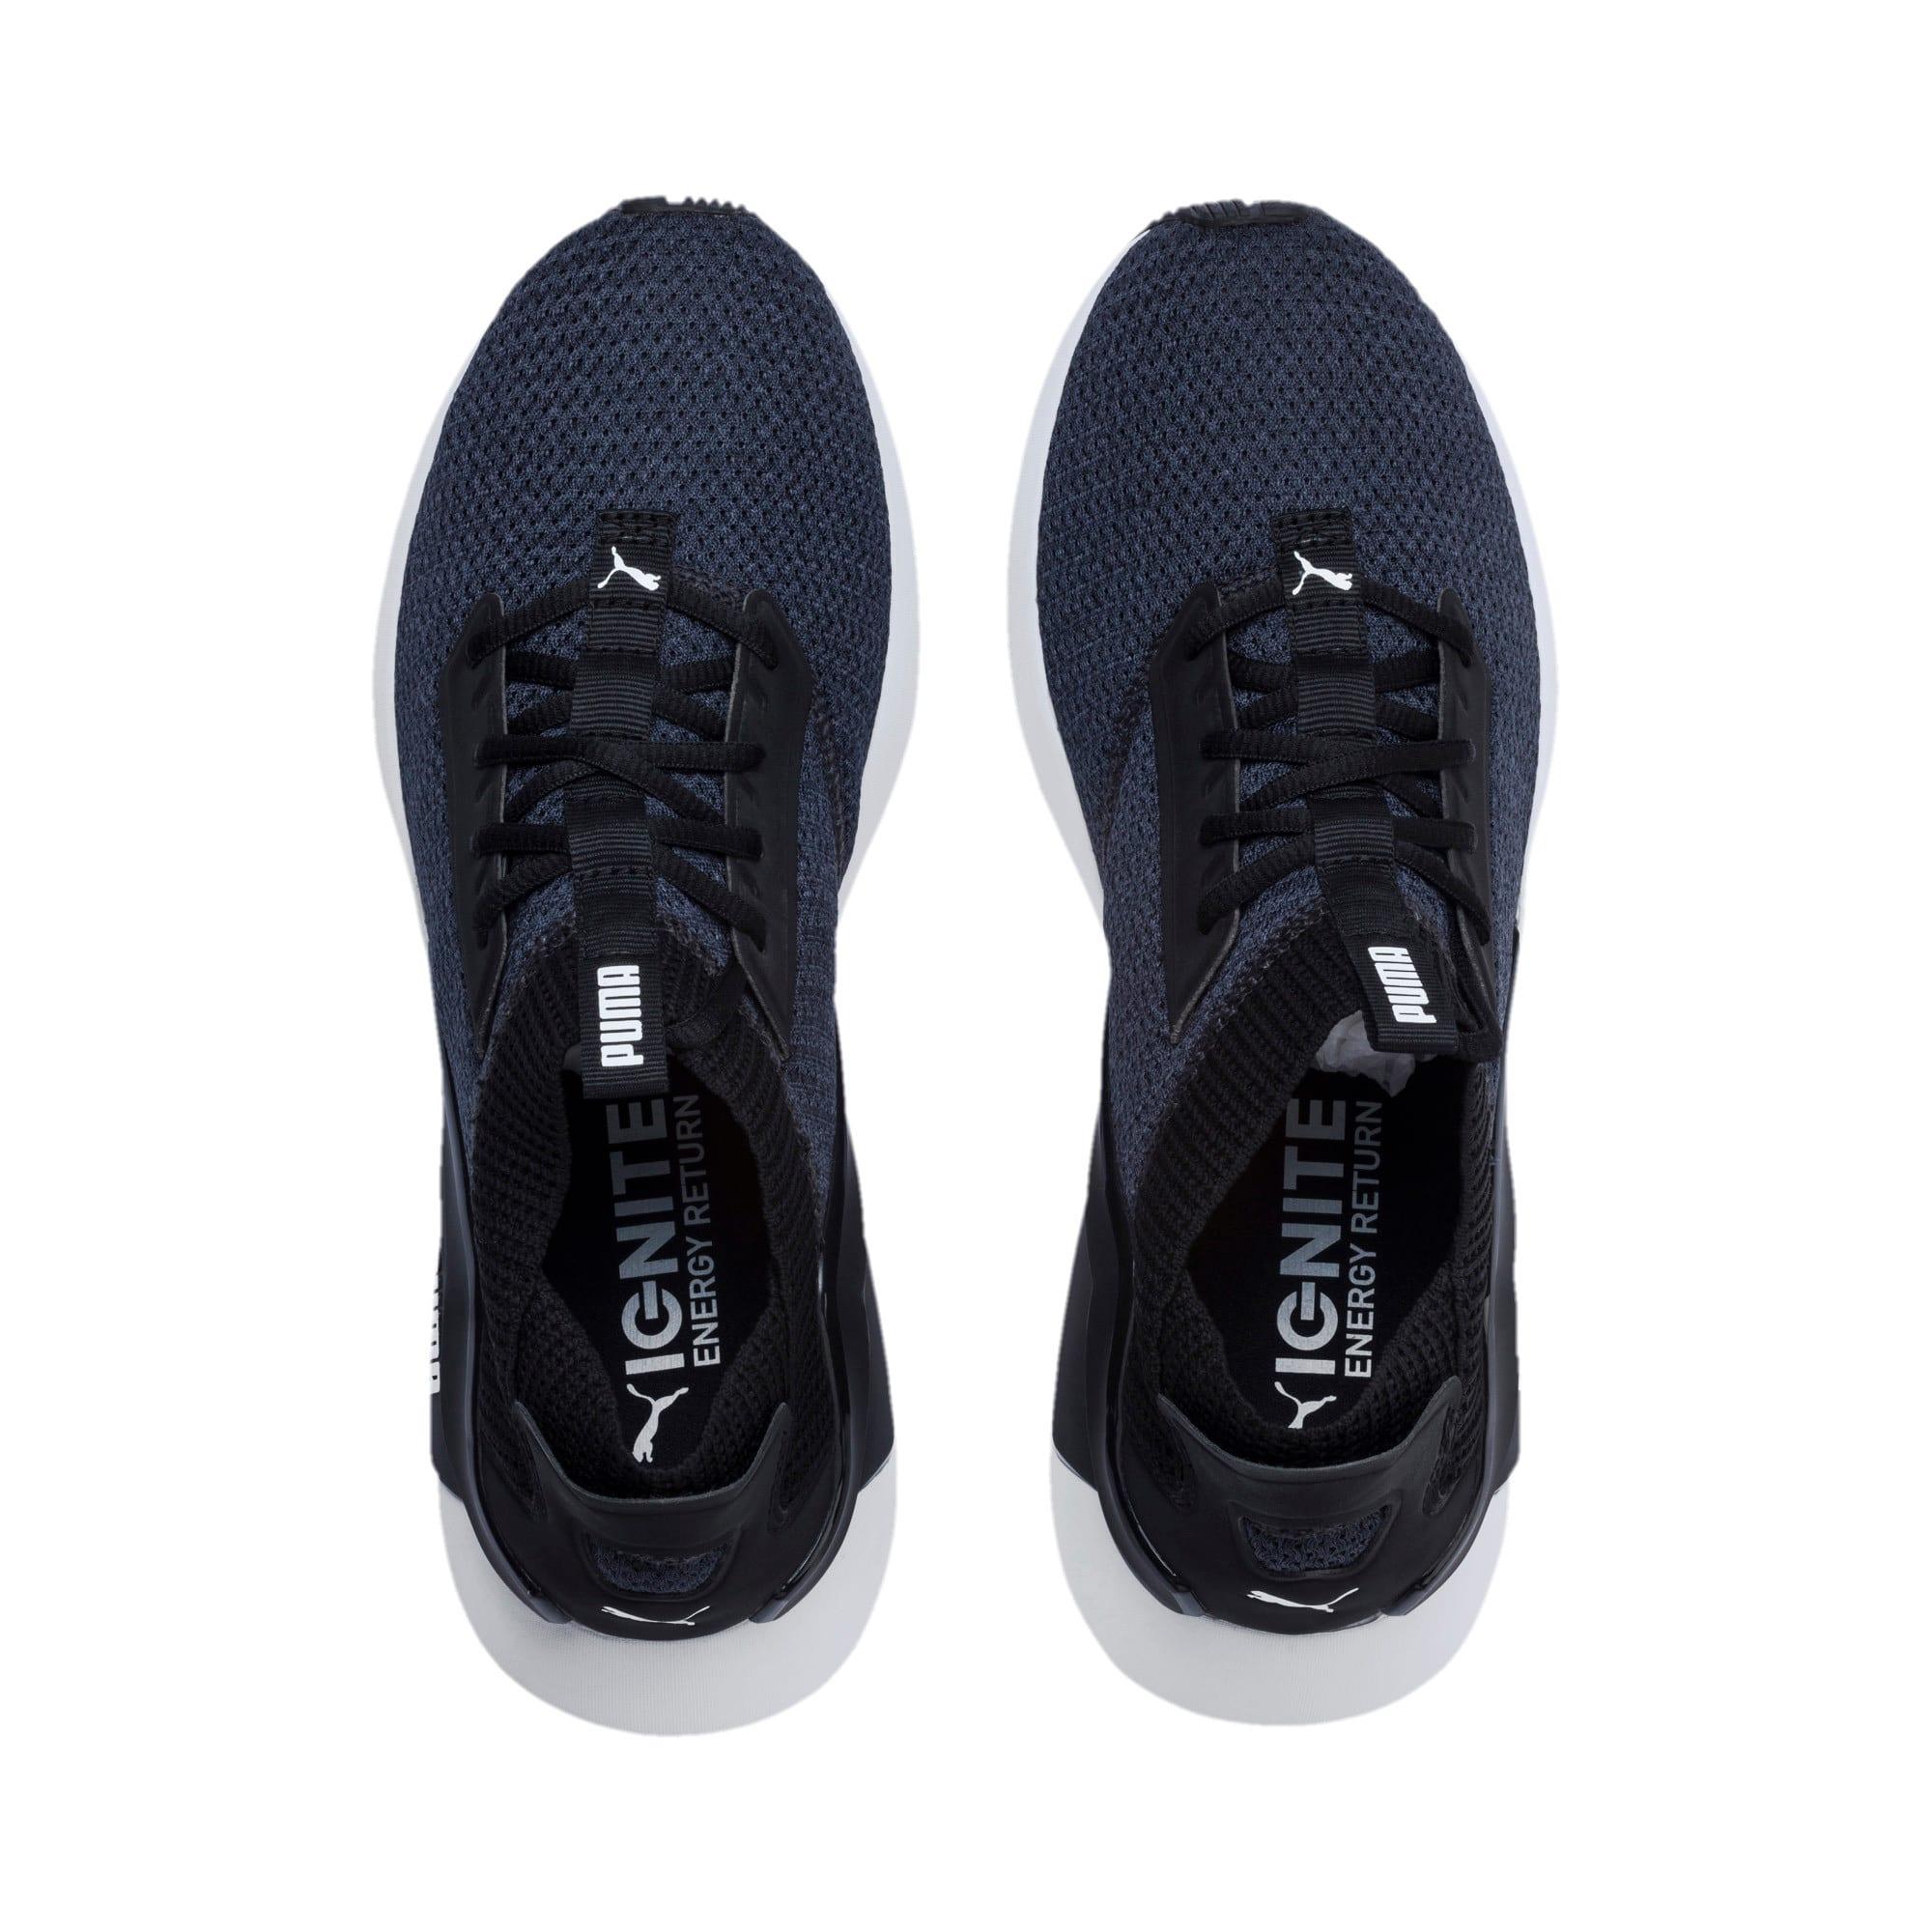 Thumbnail 6 of Rogue Men's Running Shoes, Puma Black, medium